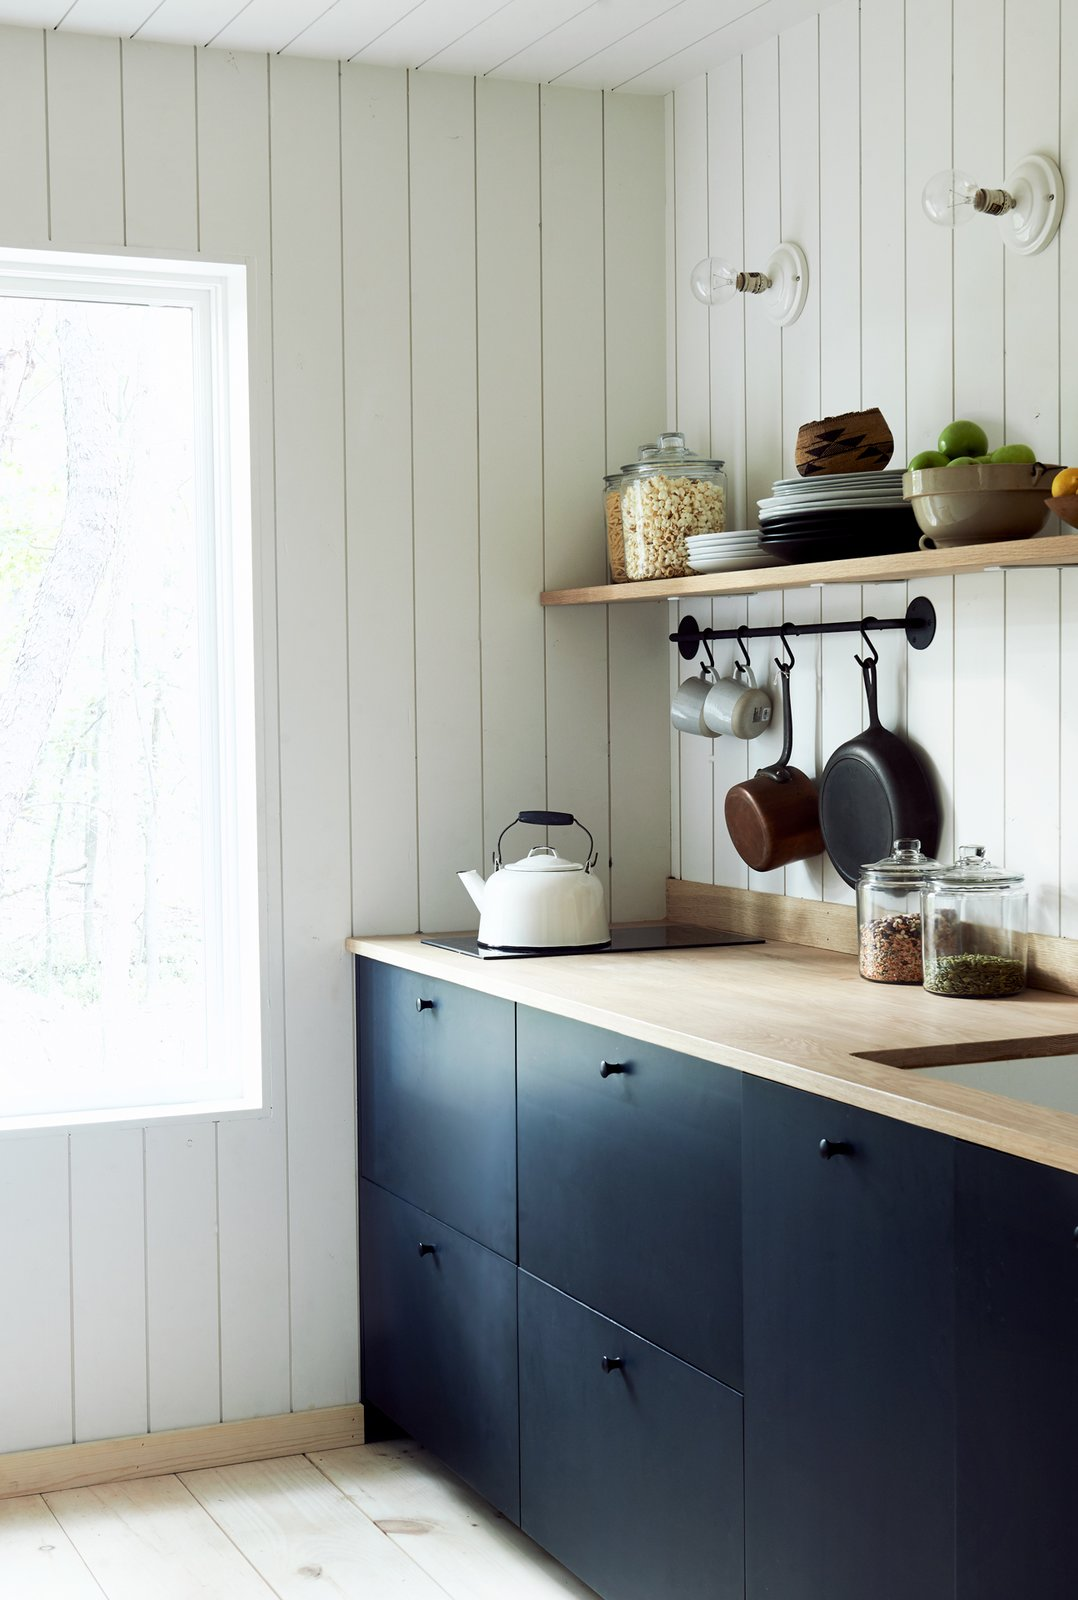 The Hut kitchen